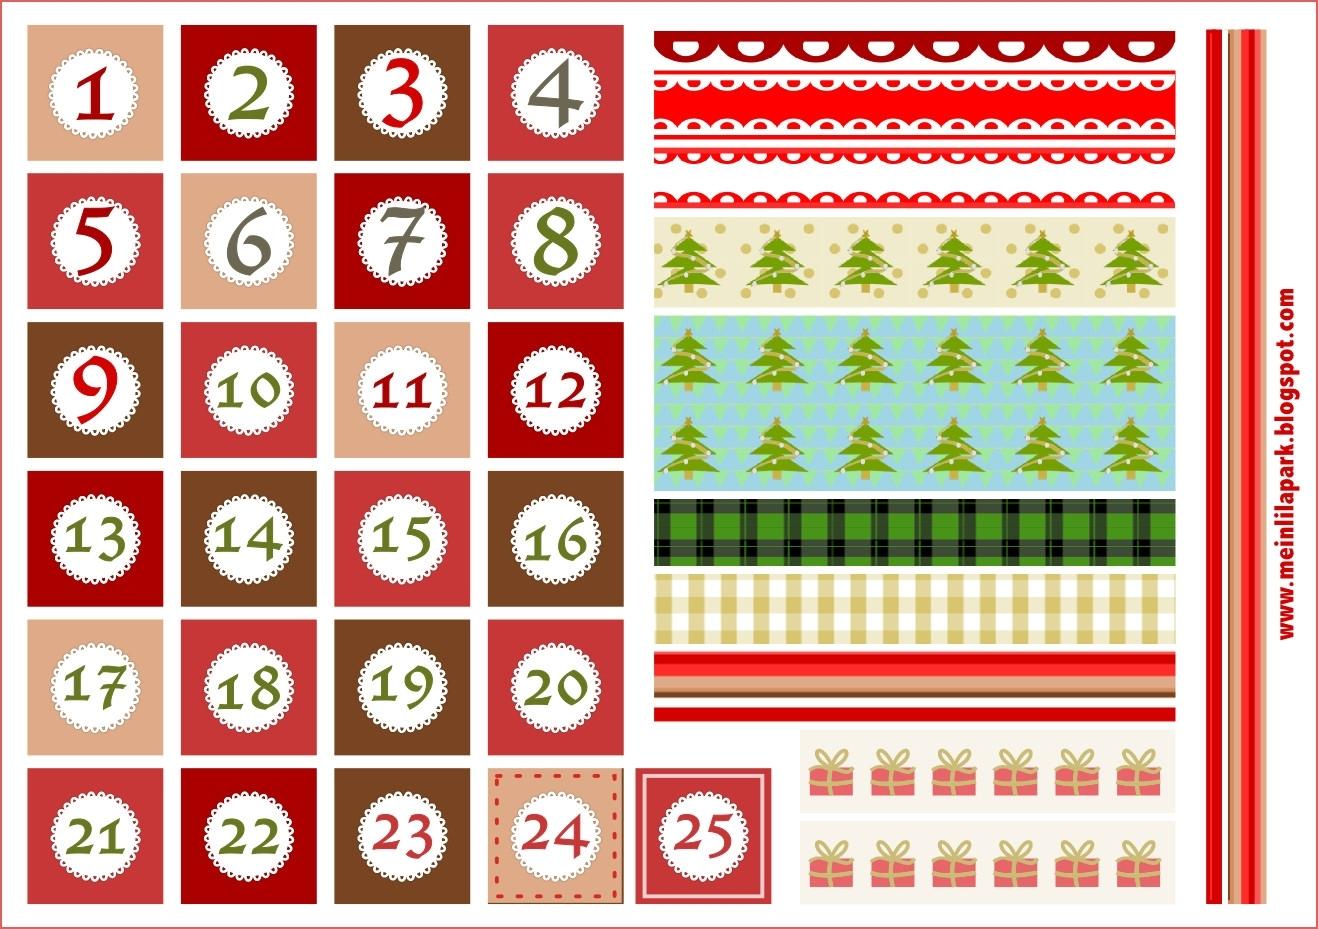 Printable Advent Calendar Number Calendar Template 2019 Calendar for Large Printable Calendar Numbers 1-31